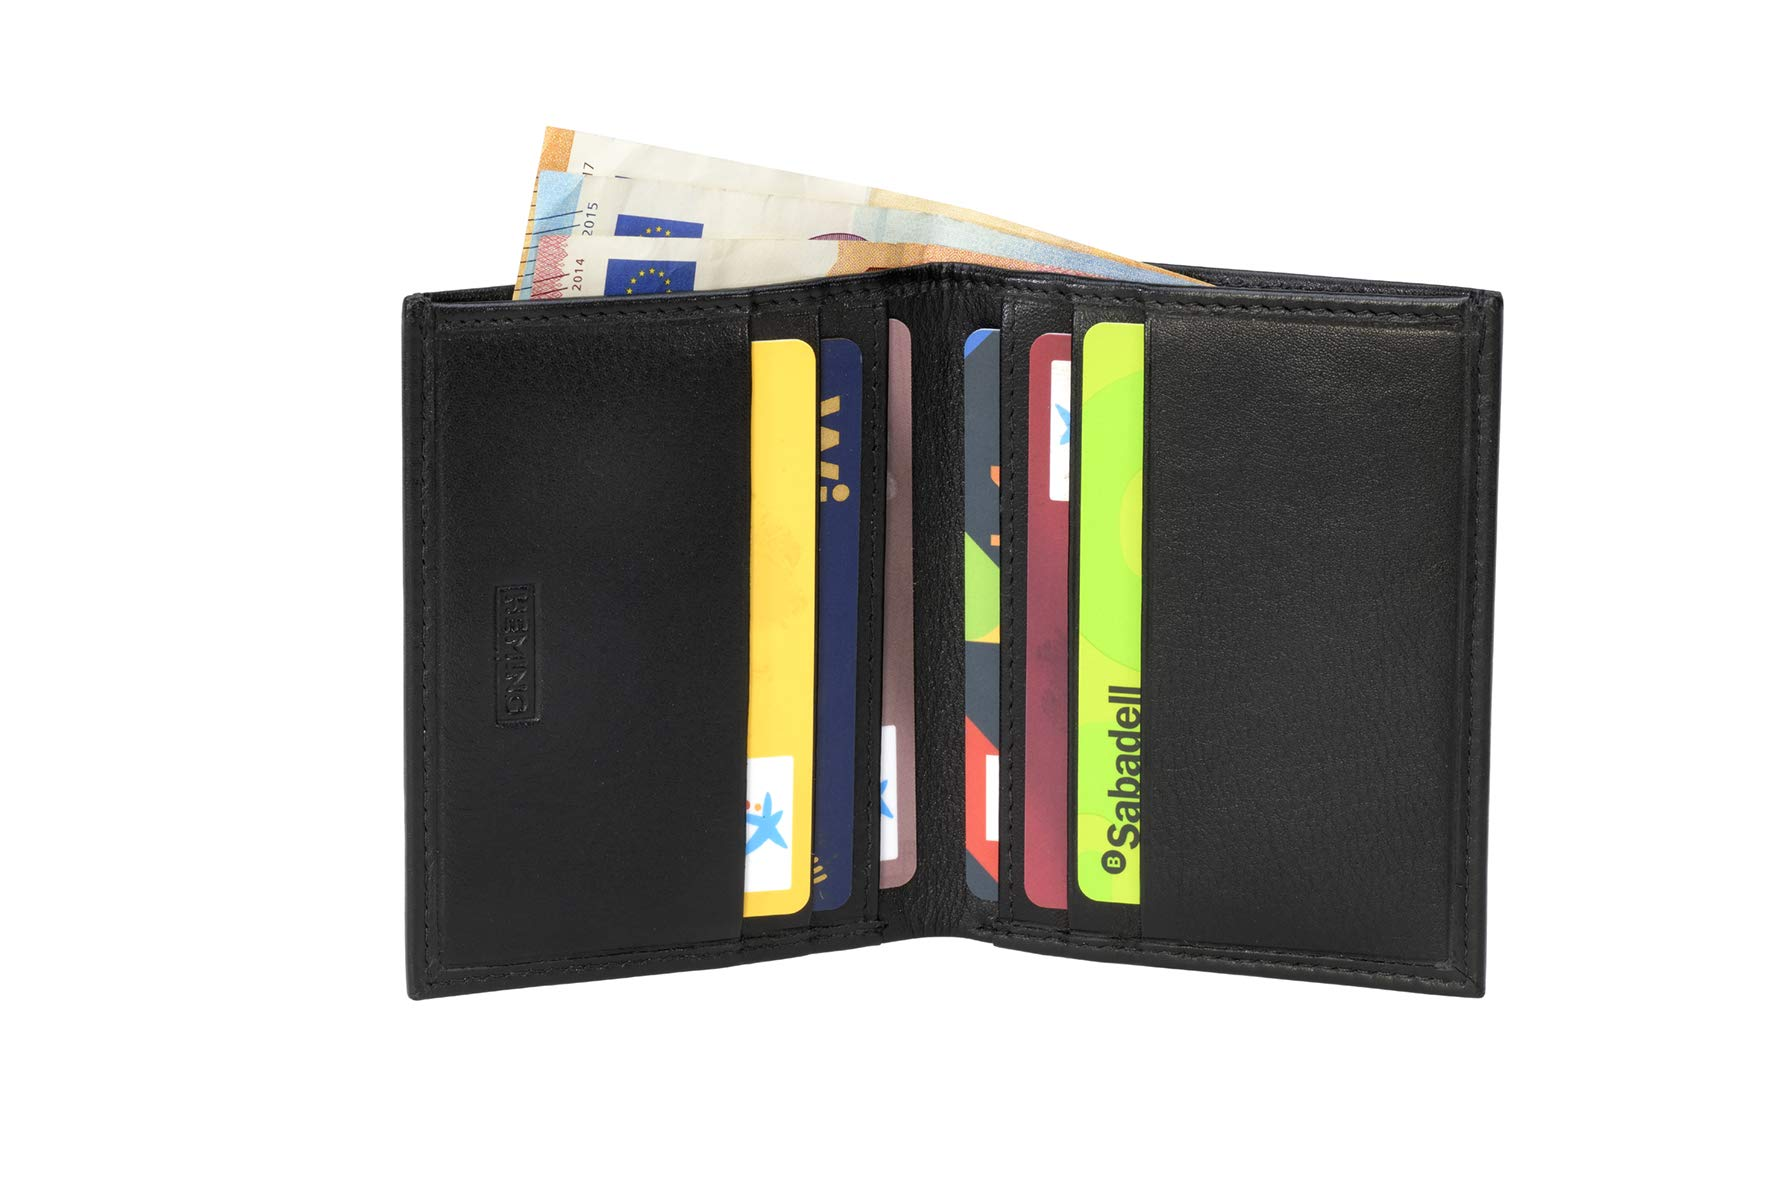 Heming / Cartera de piel minimalista para tarjetas y billetes. Billetera pequeña. Cartera tarjetero